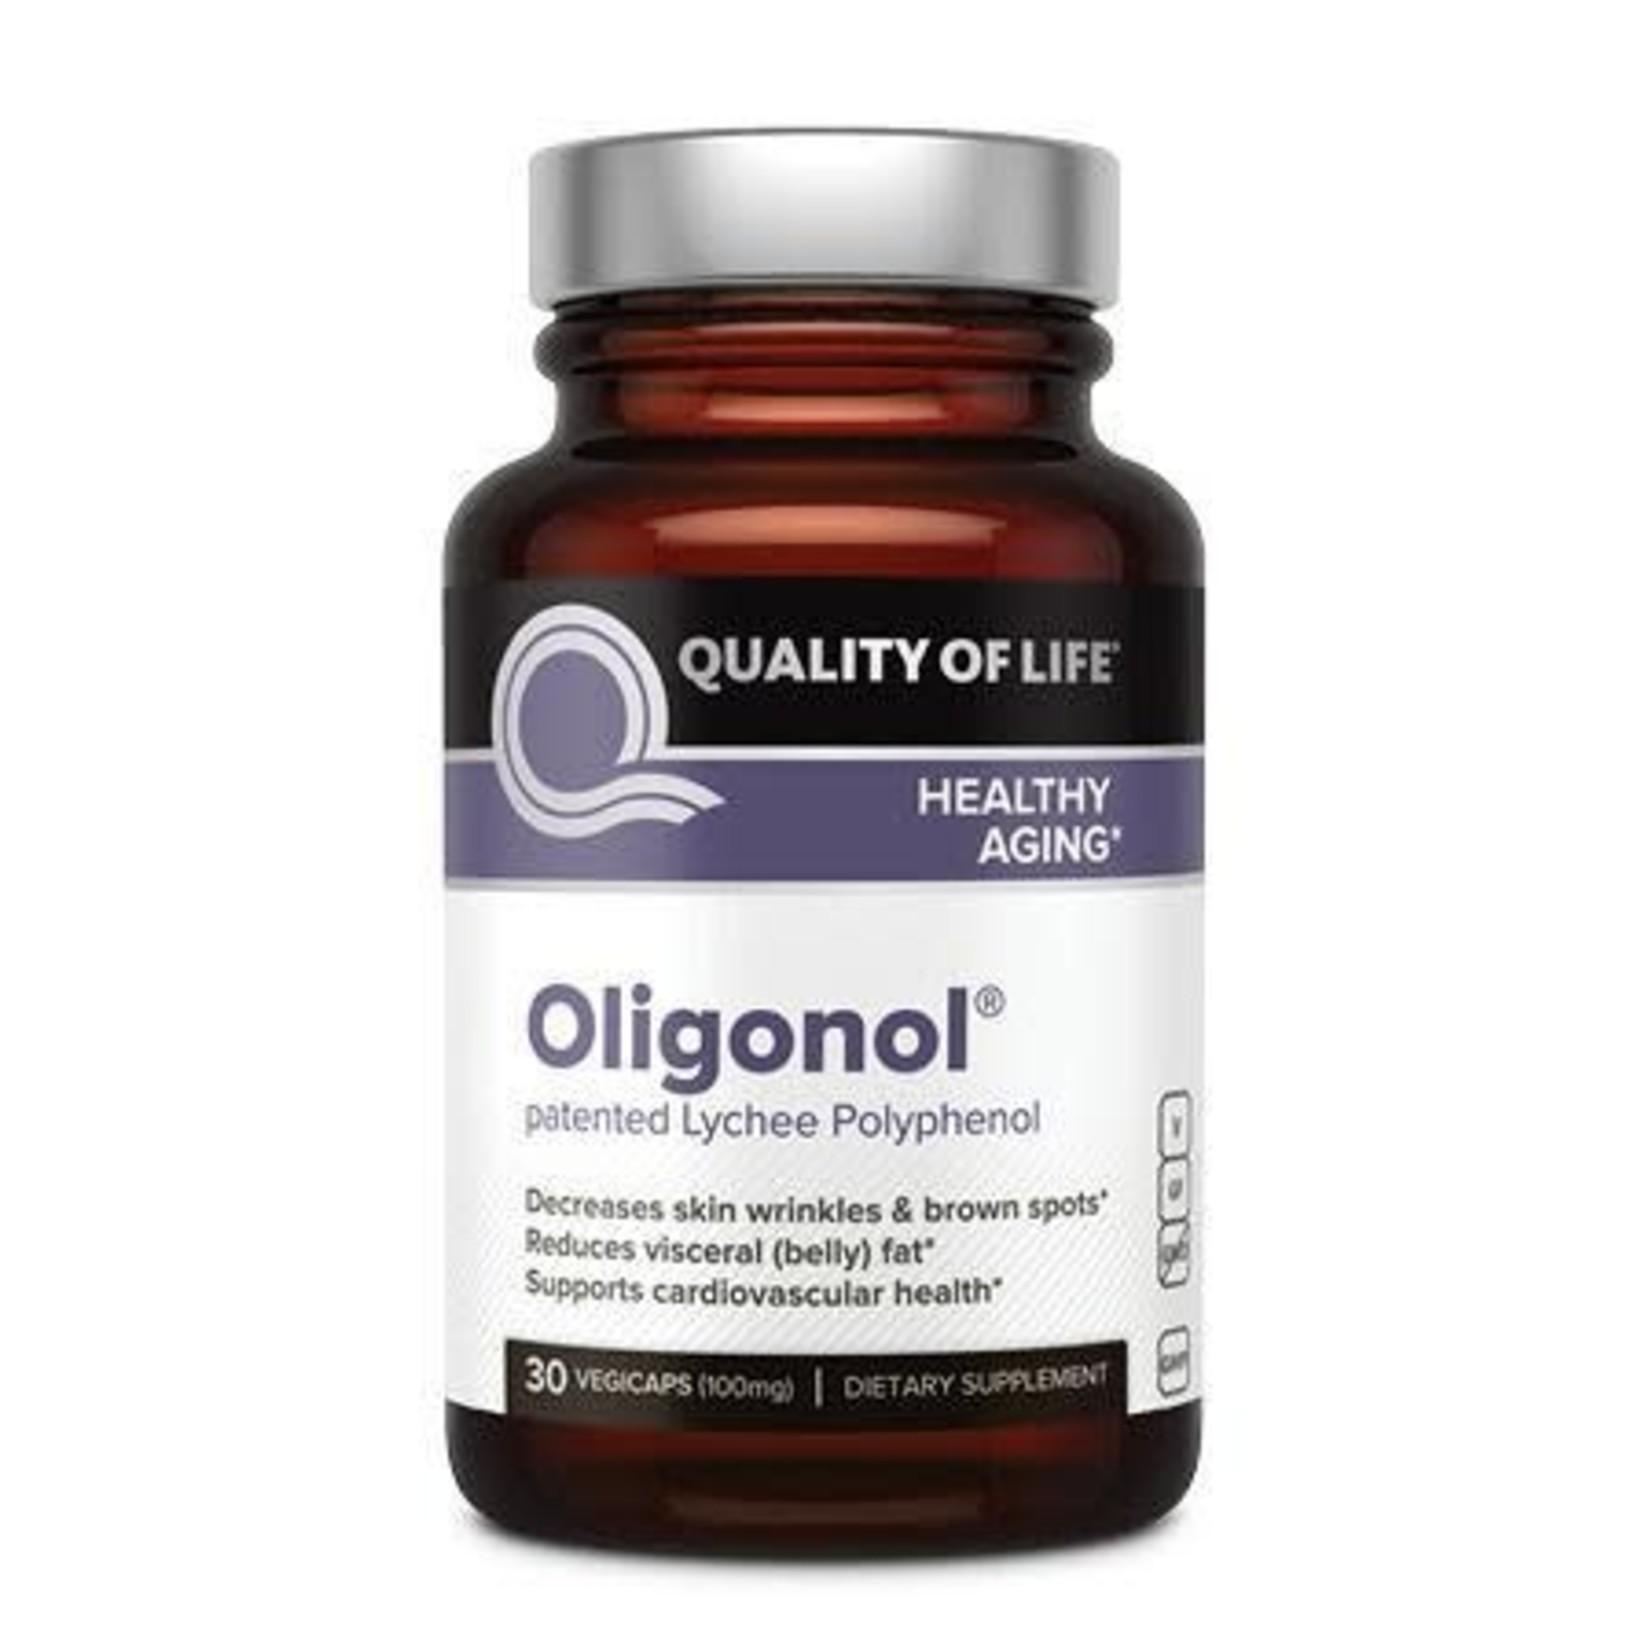 Quality of Life QOL Oligonol Patented Lychee Polyphenol 30ct